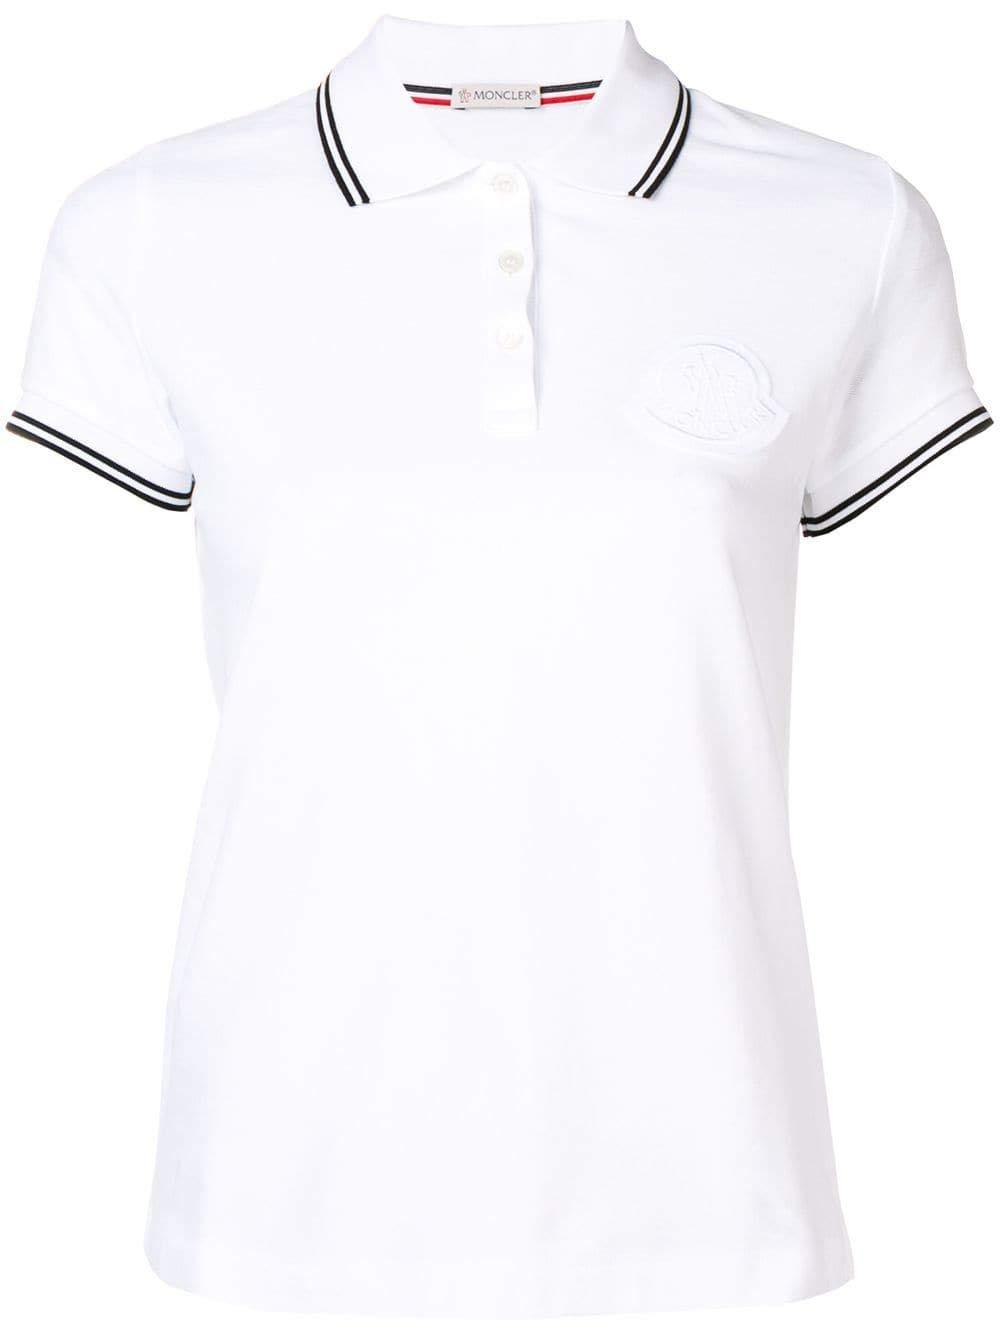 Moncler Women's 8386061V8003001 White Cotton Polo Shirt